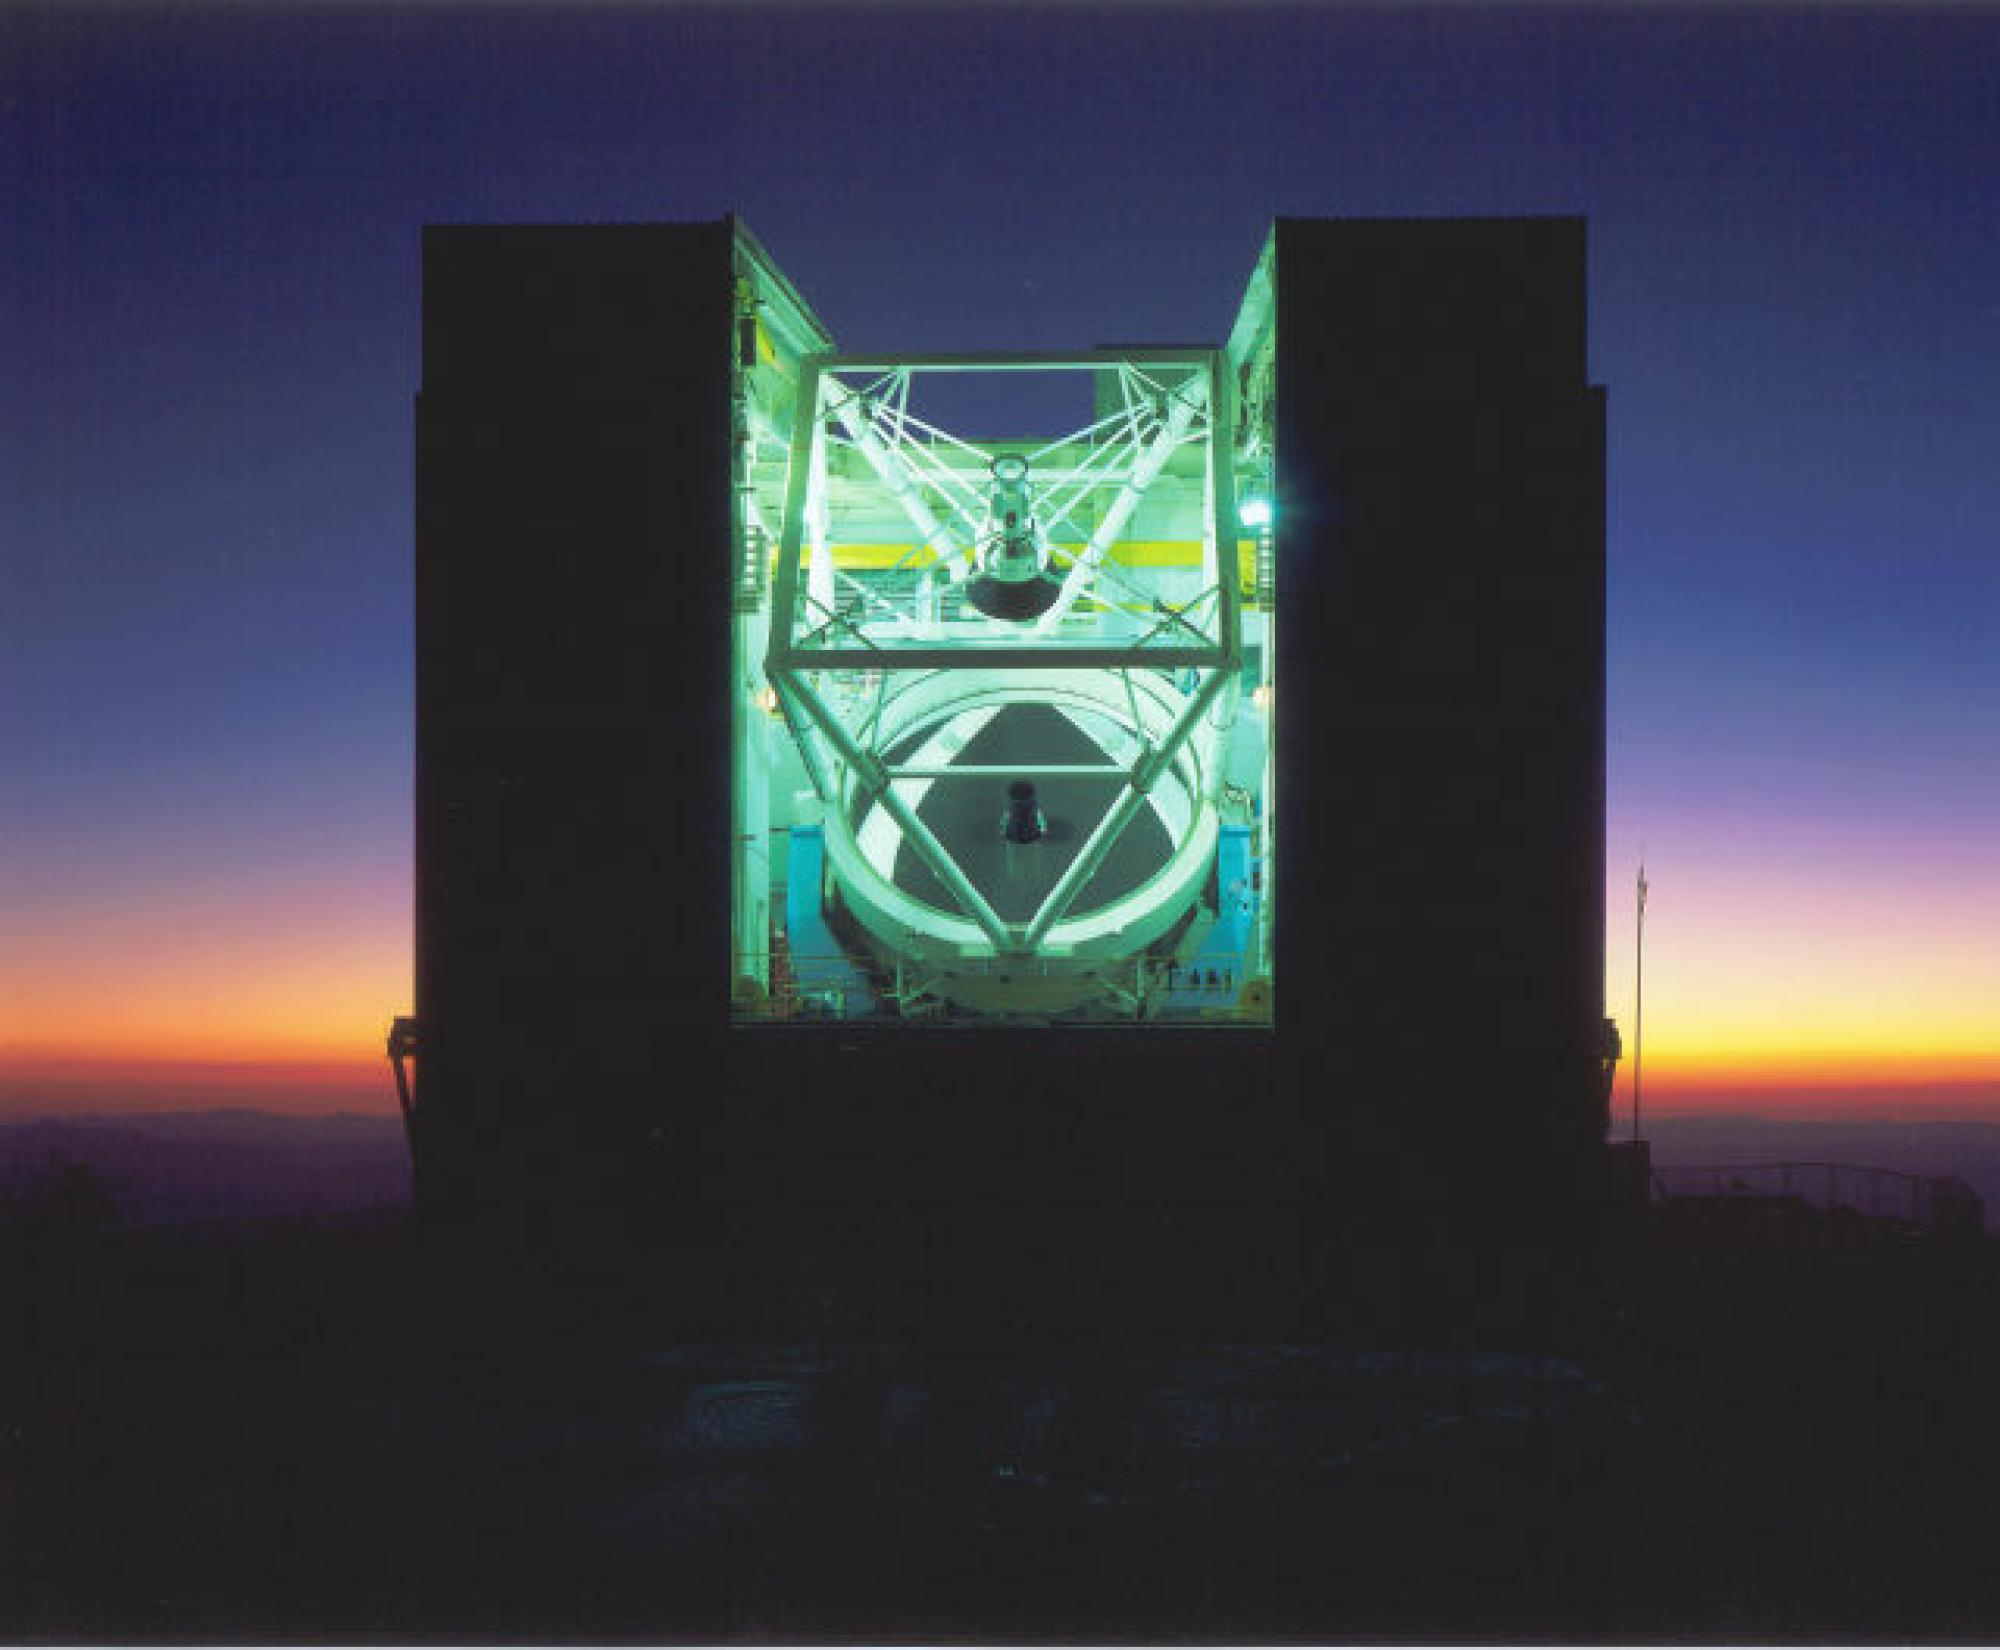 The 21-foot diameter MMT Observatory on Mount Hopkins, Ariz.